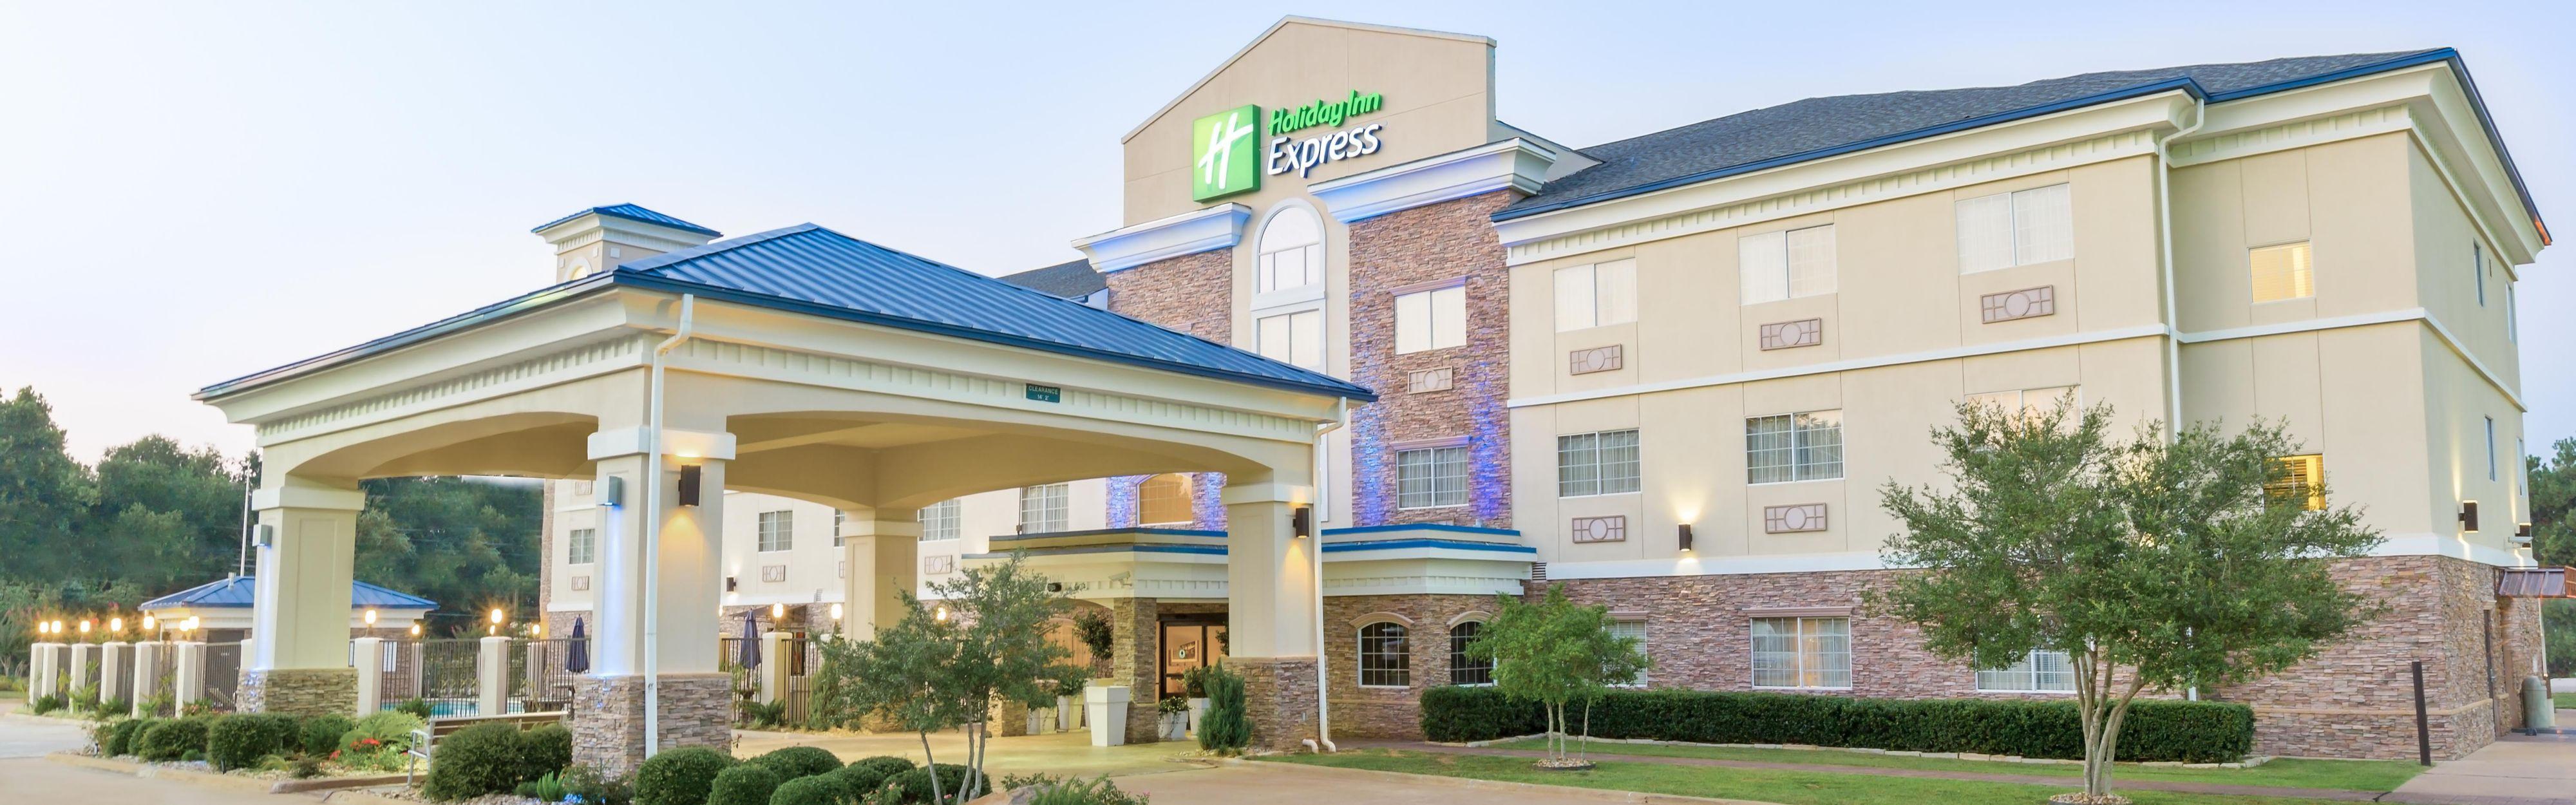 Holiday Inn Express Palestine image 0